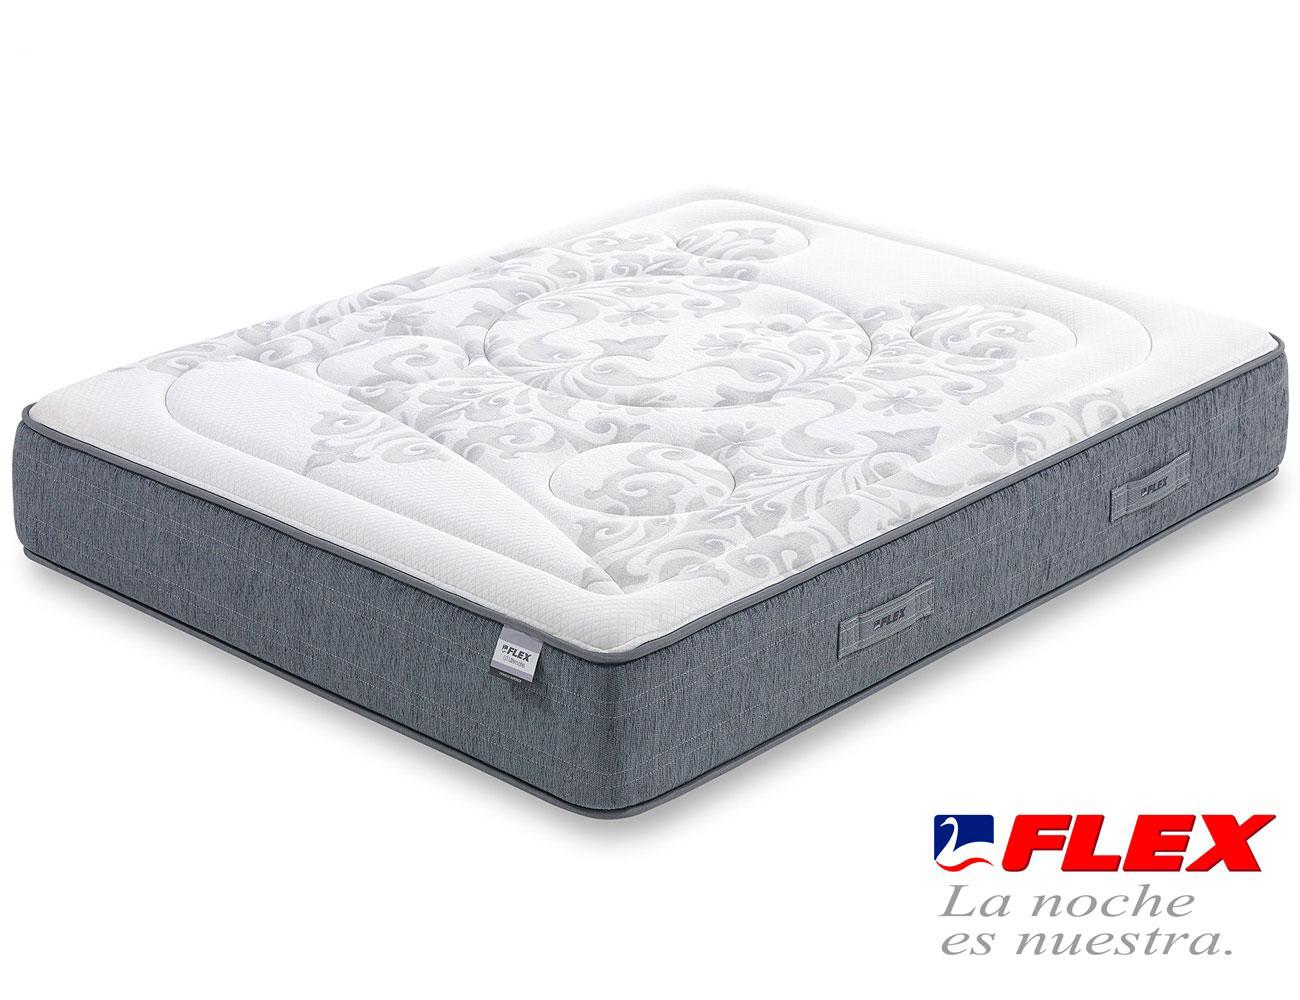 Colchon flex airvex viscoelastica gel garbi superior4